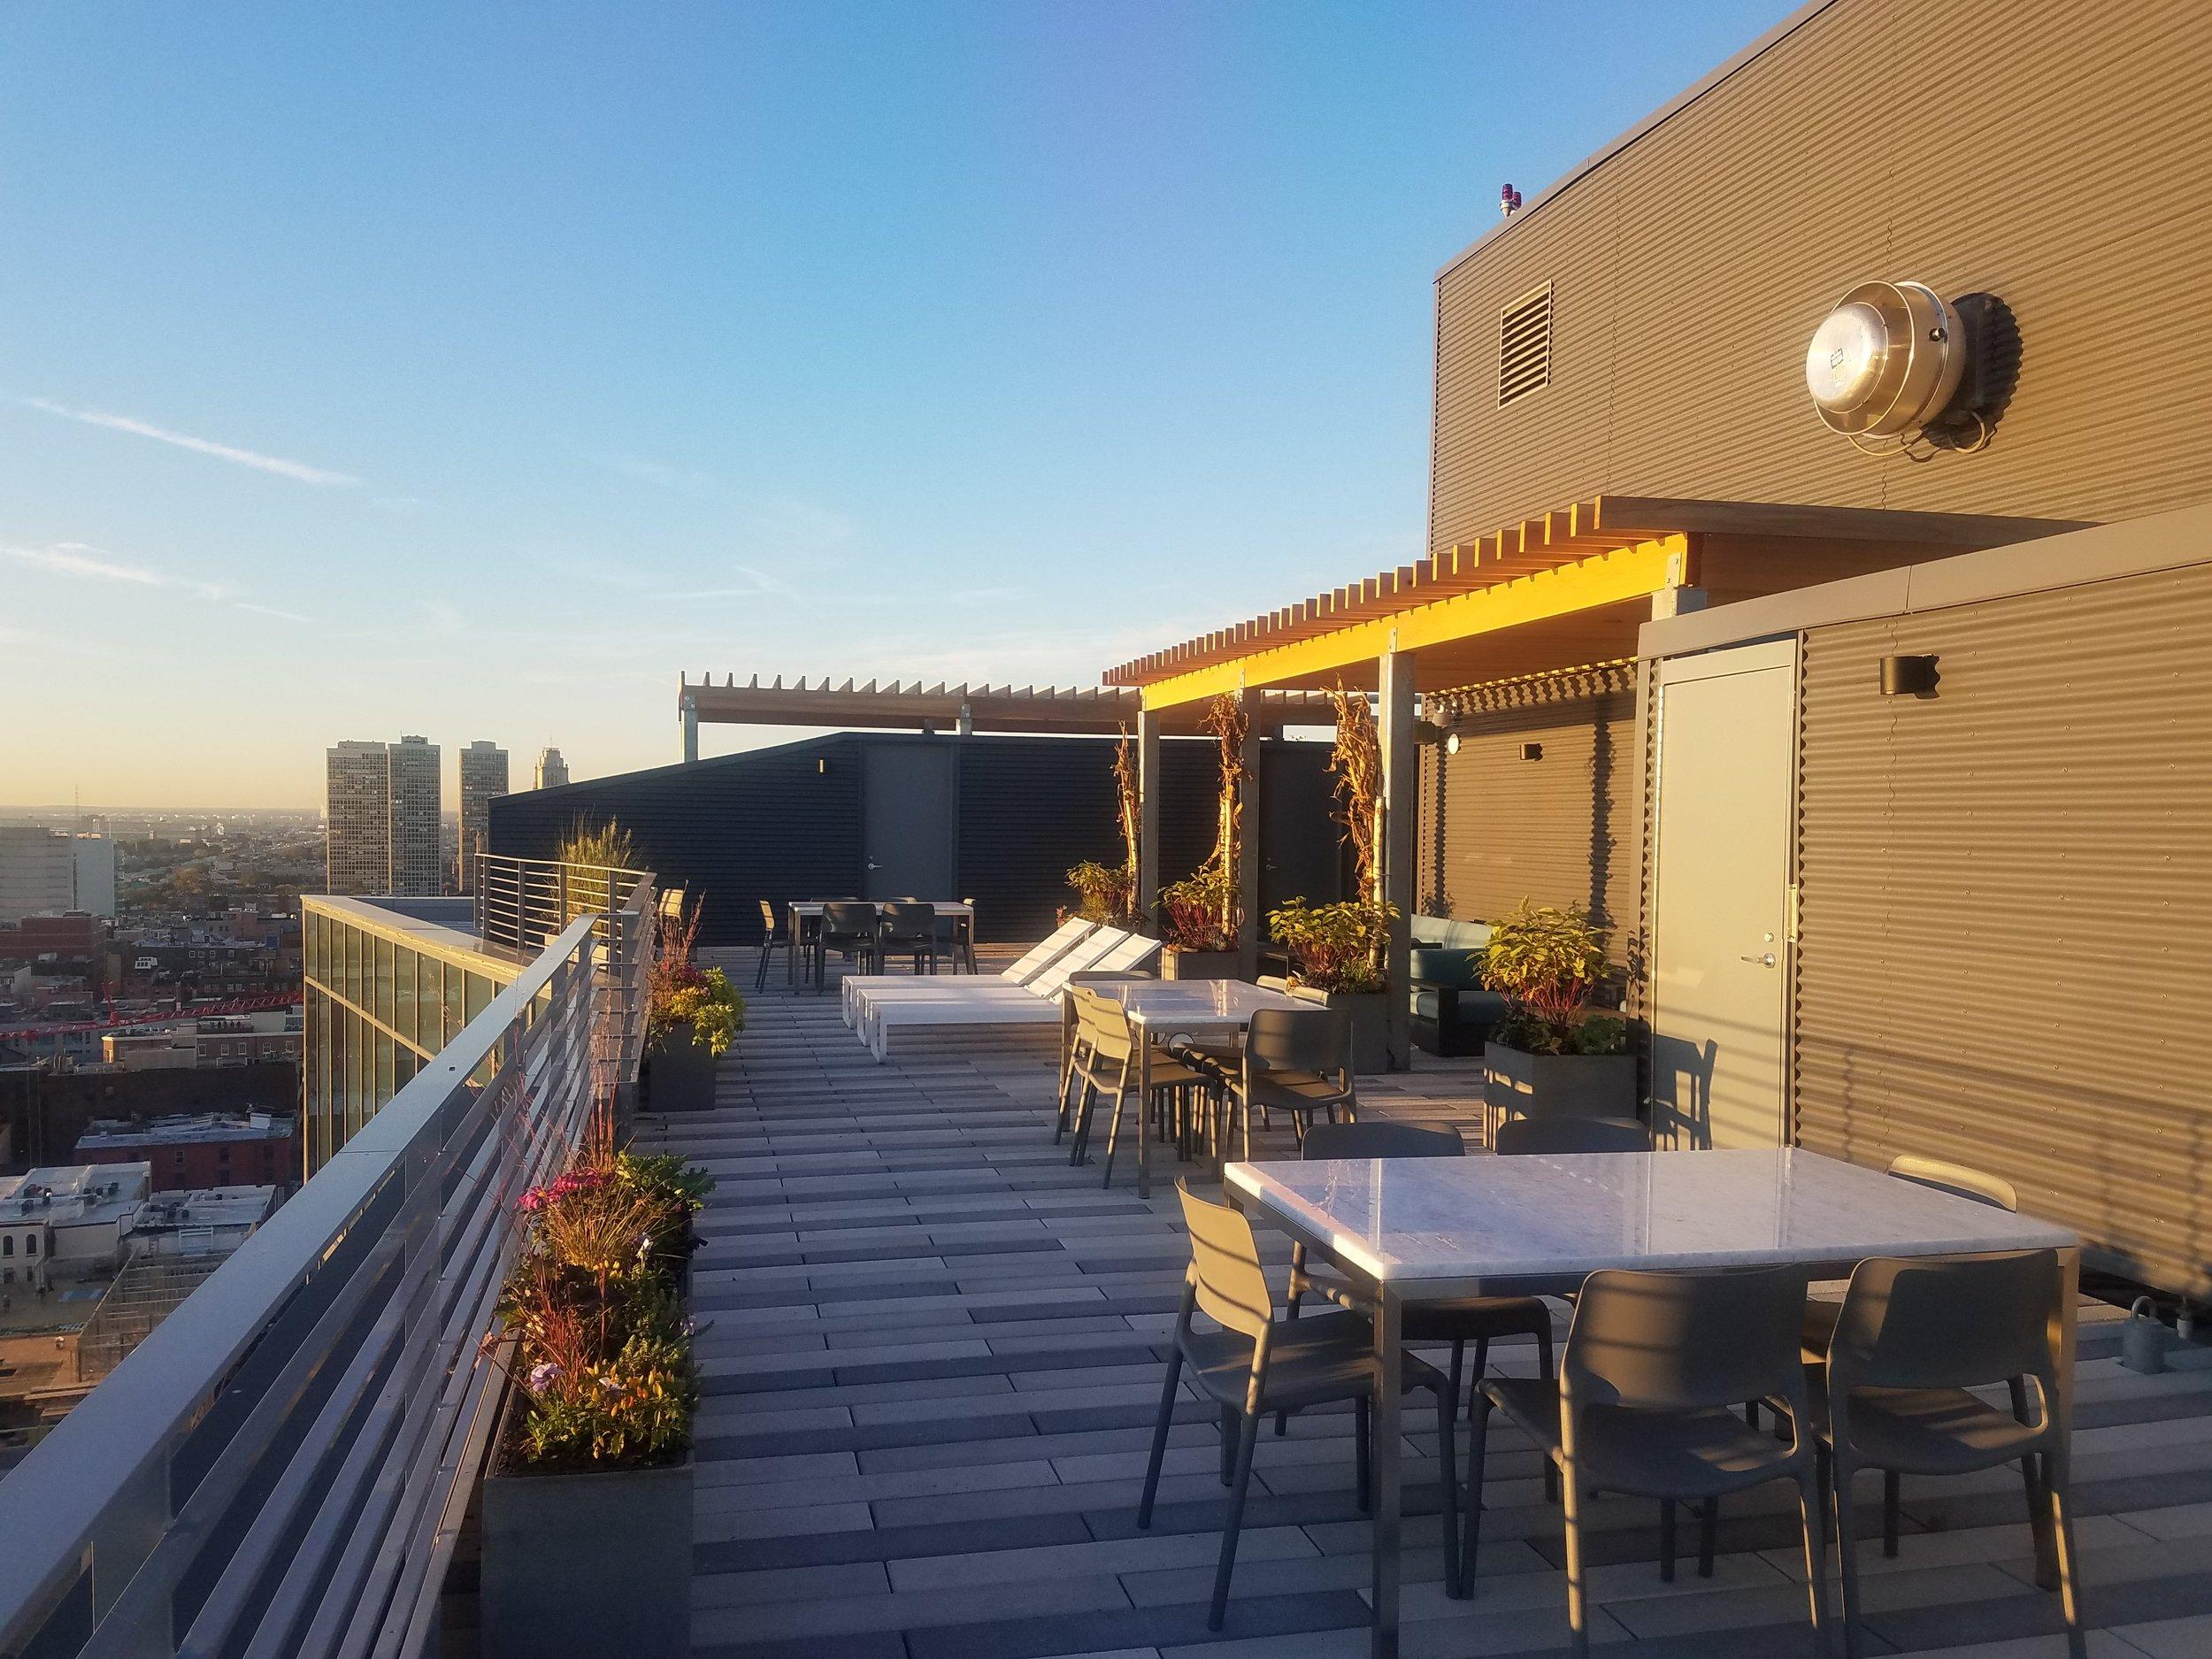 13.5 Best View in Philadelphia Rooftop Terrace.jpg